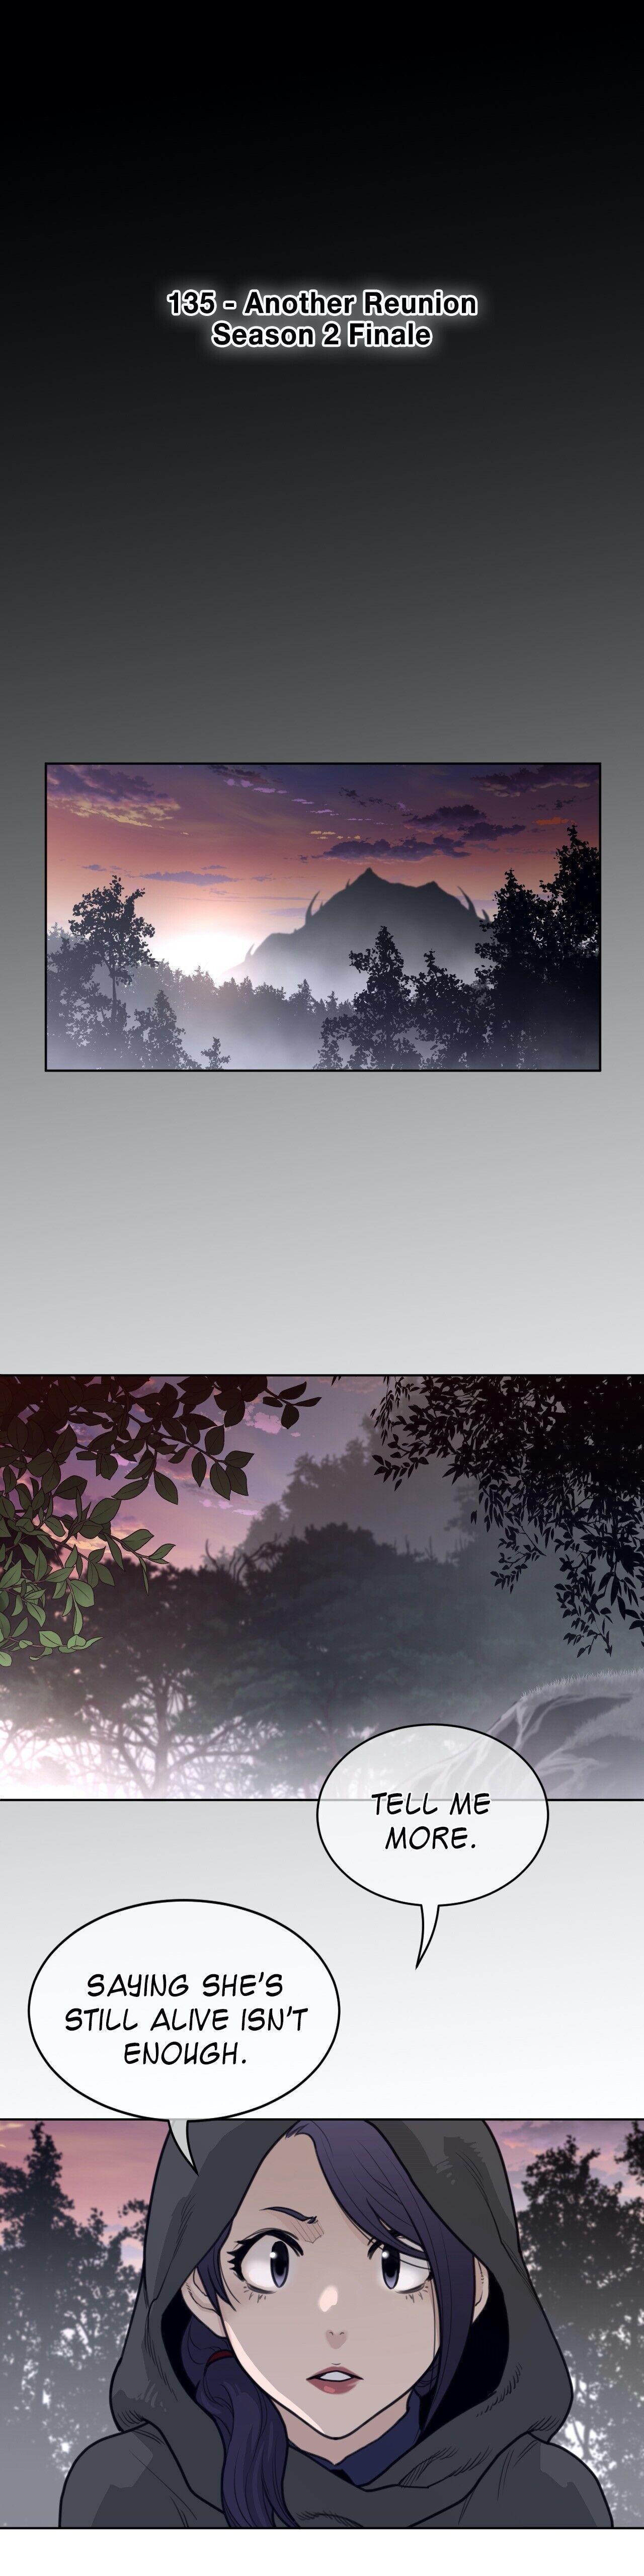 Perfect Half Chapter 135 : Another Reunion (Season 2 Finale) page 4 - Mangakakalots.com